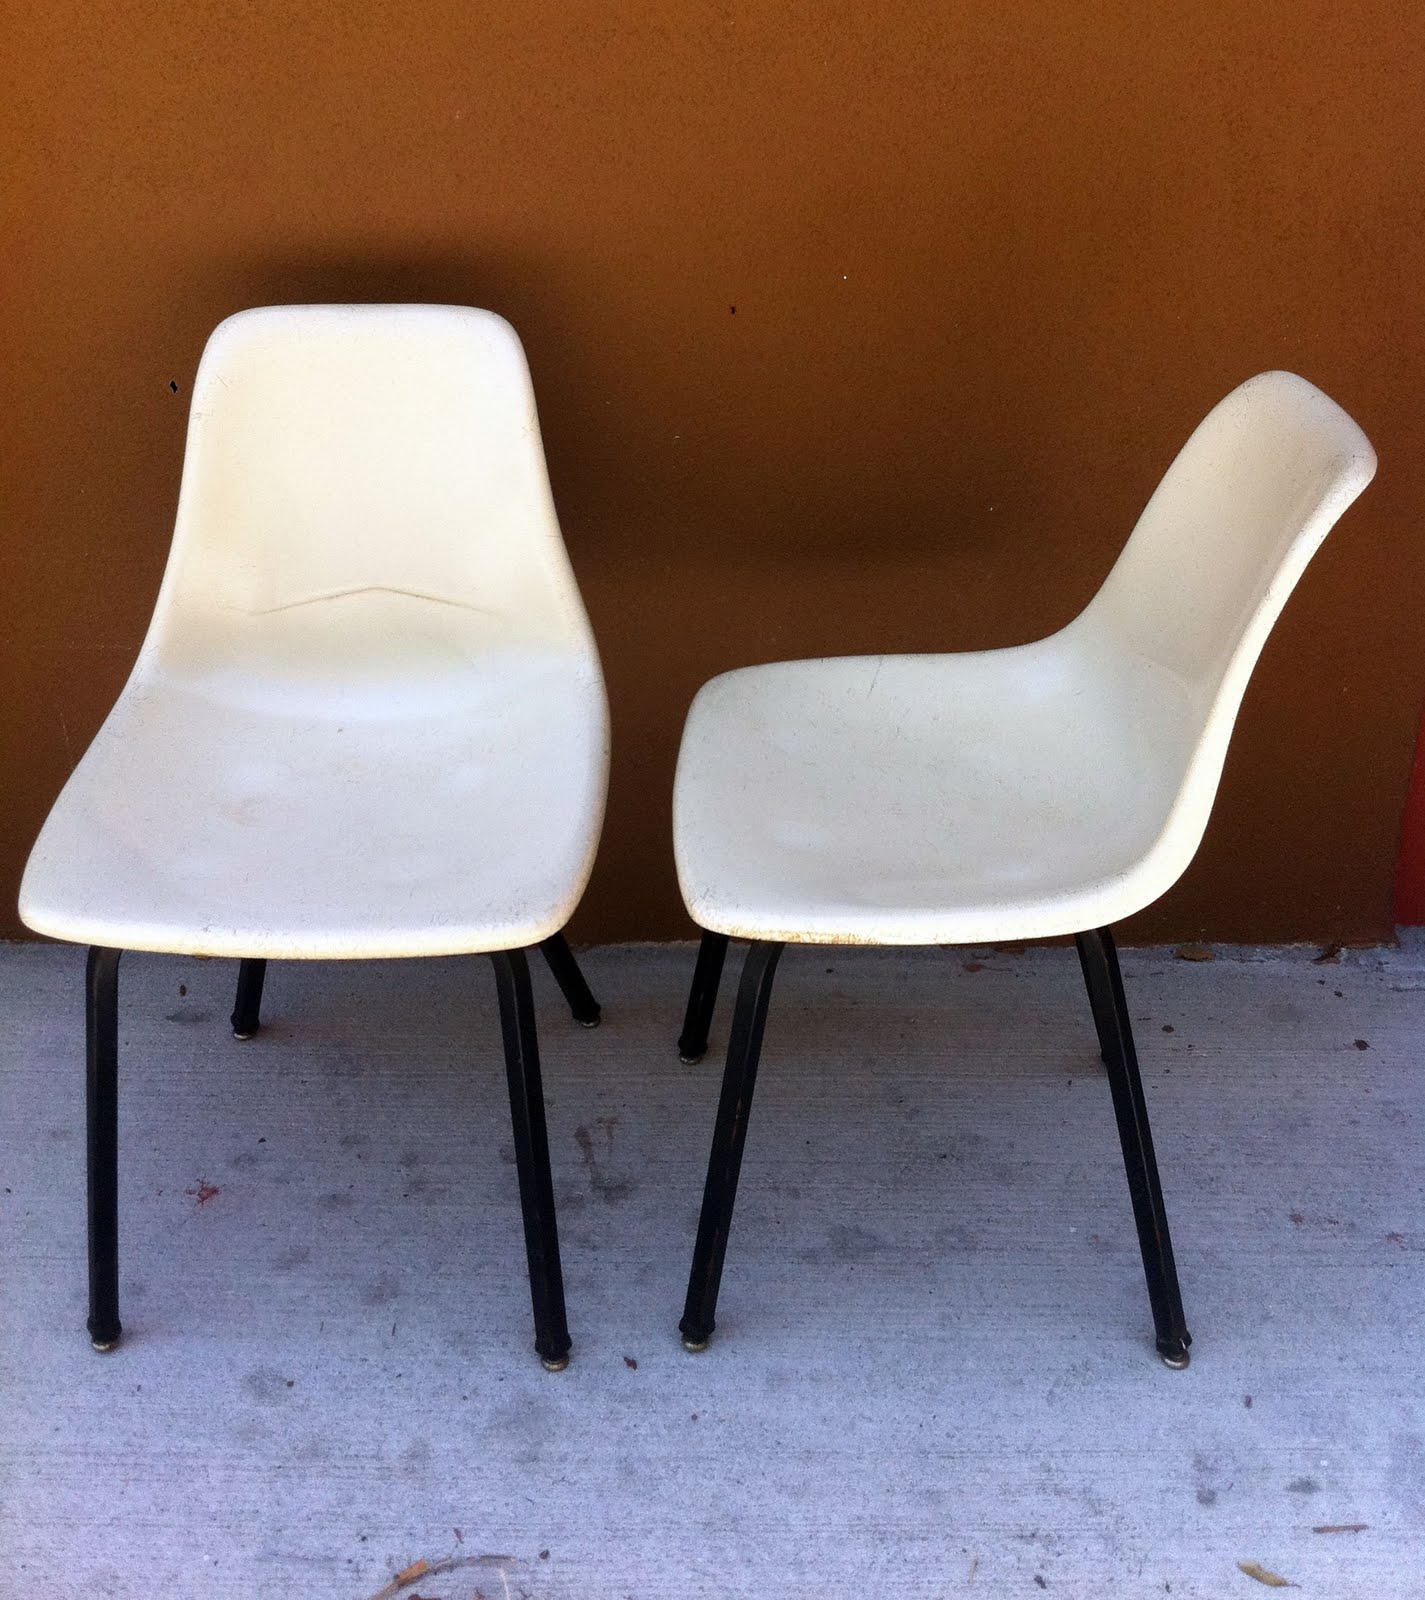 retro white chair vinyl fabric for kitchen chairs junk2funk 2 vintage fiberform fiberglass